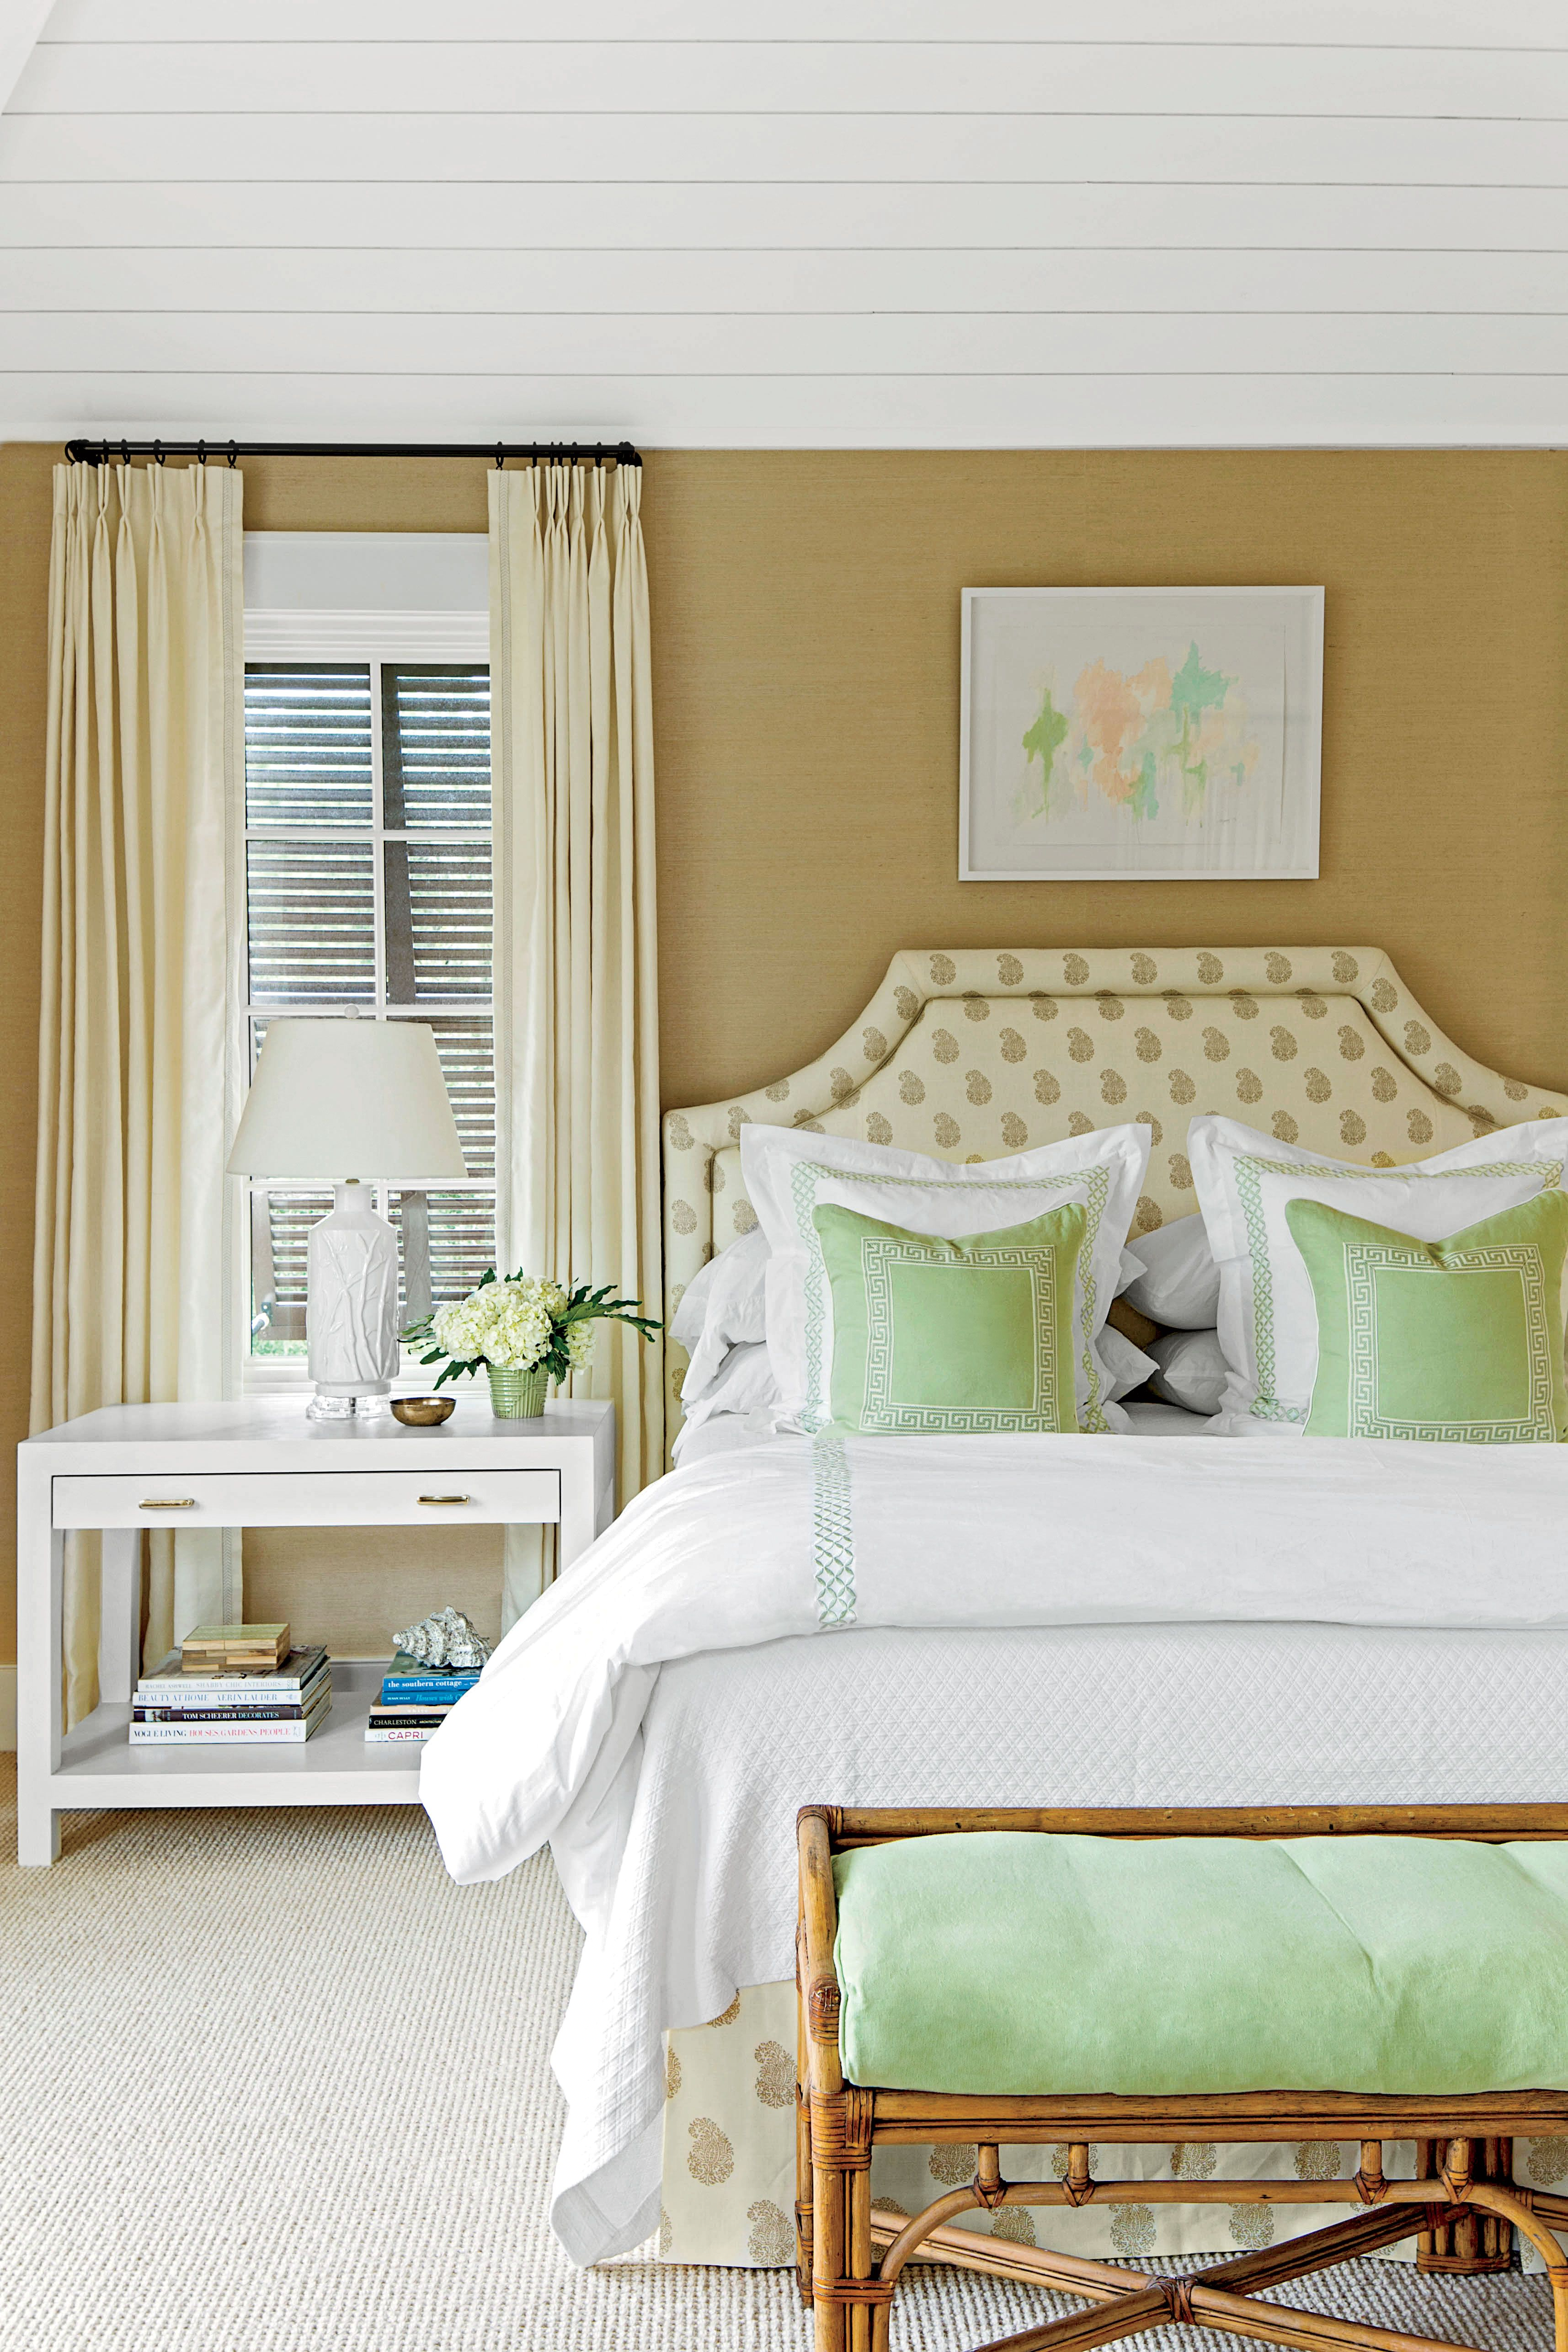 Dreamy Bedroom Decorating ideas Guest bedroom decor